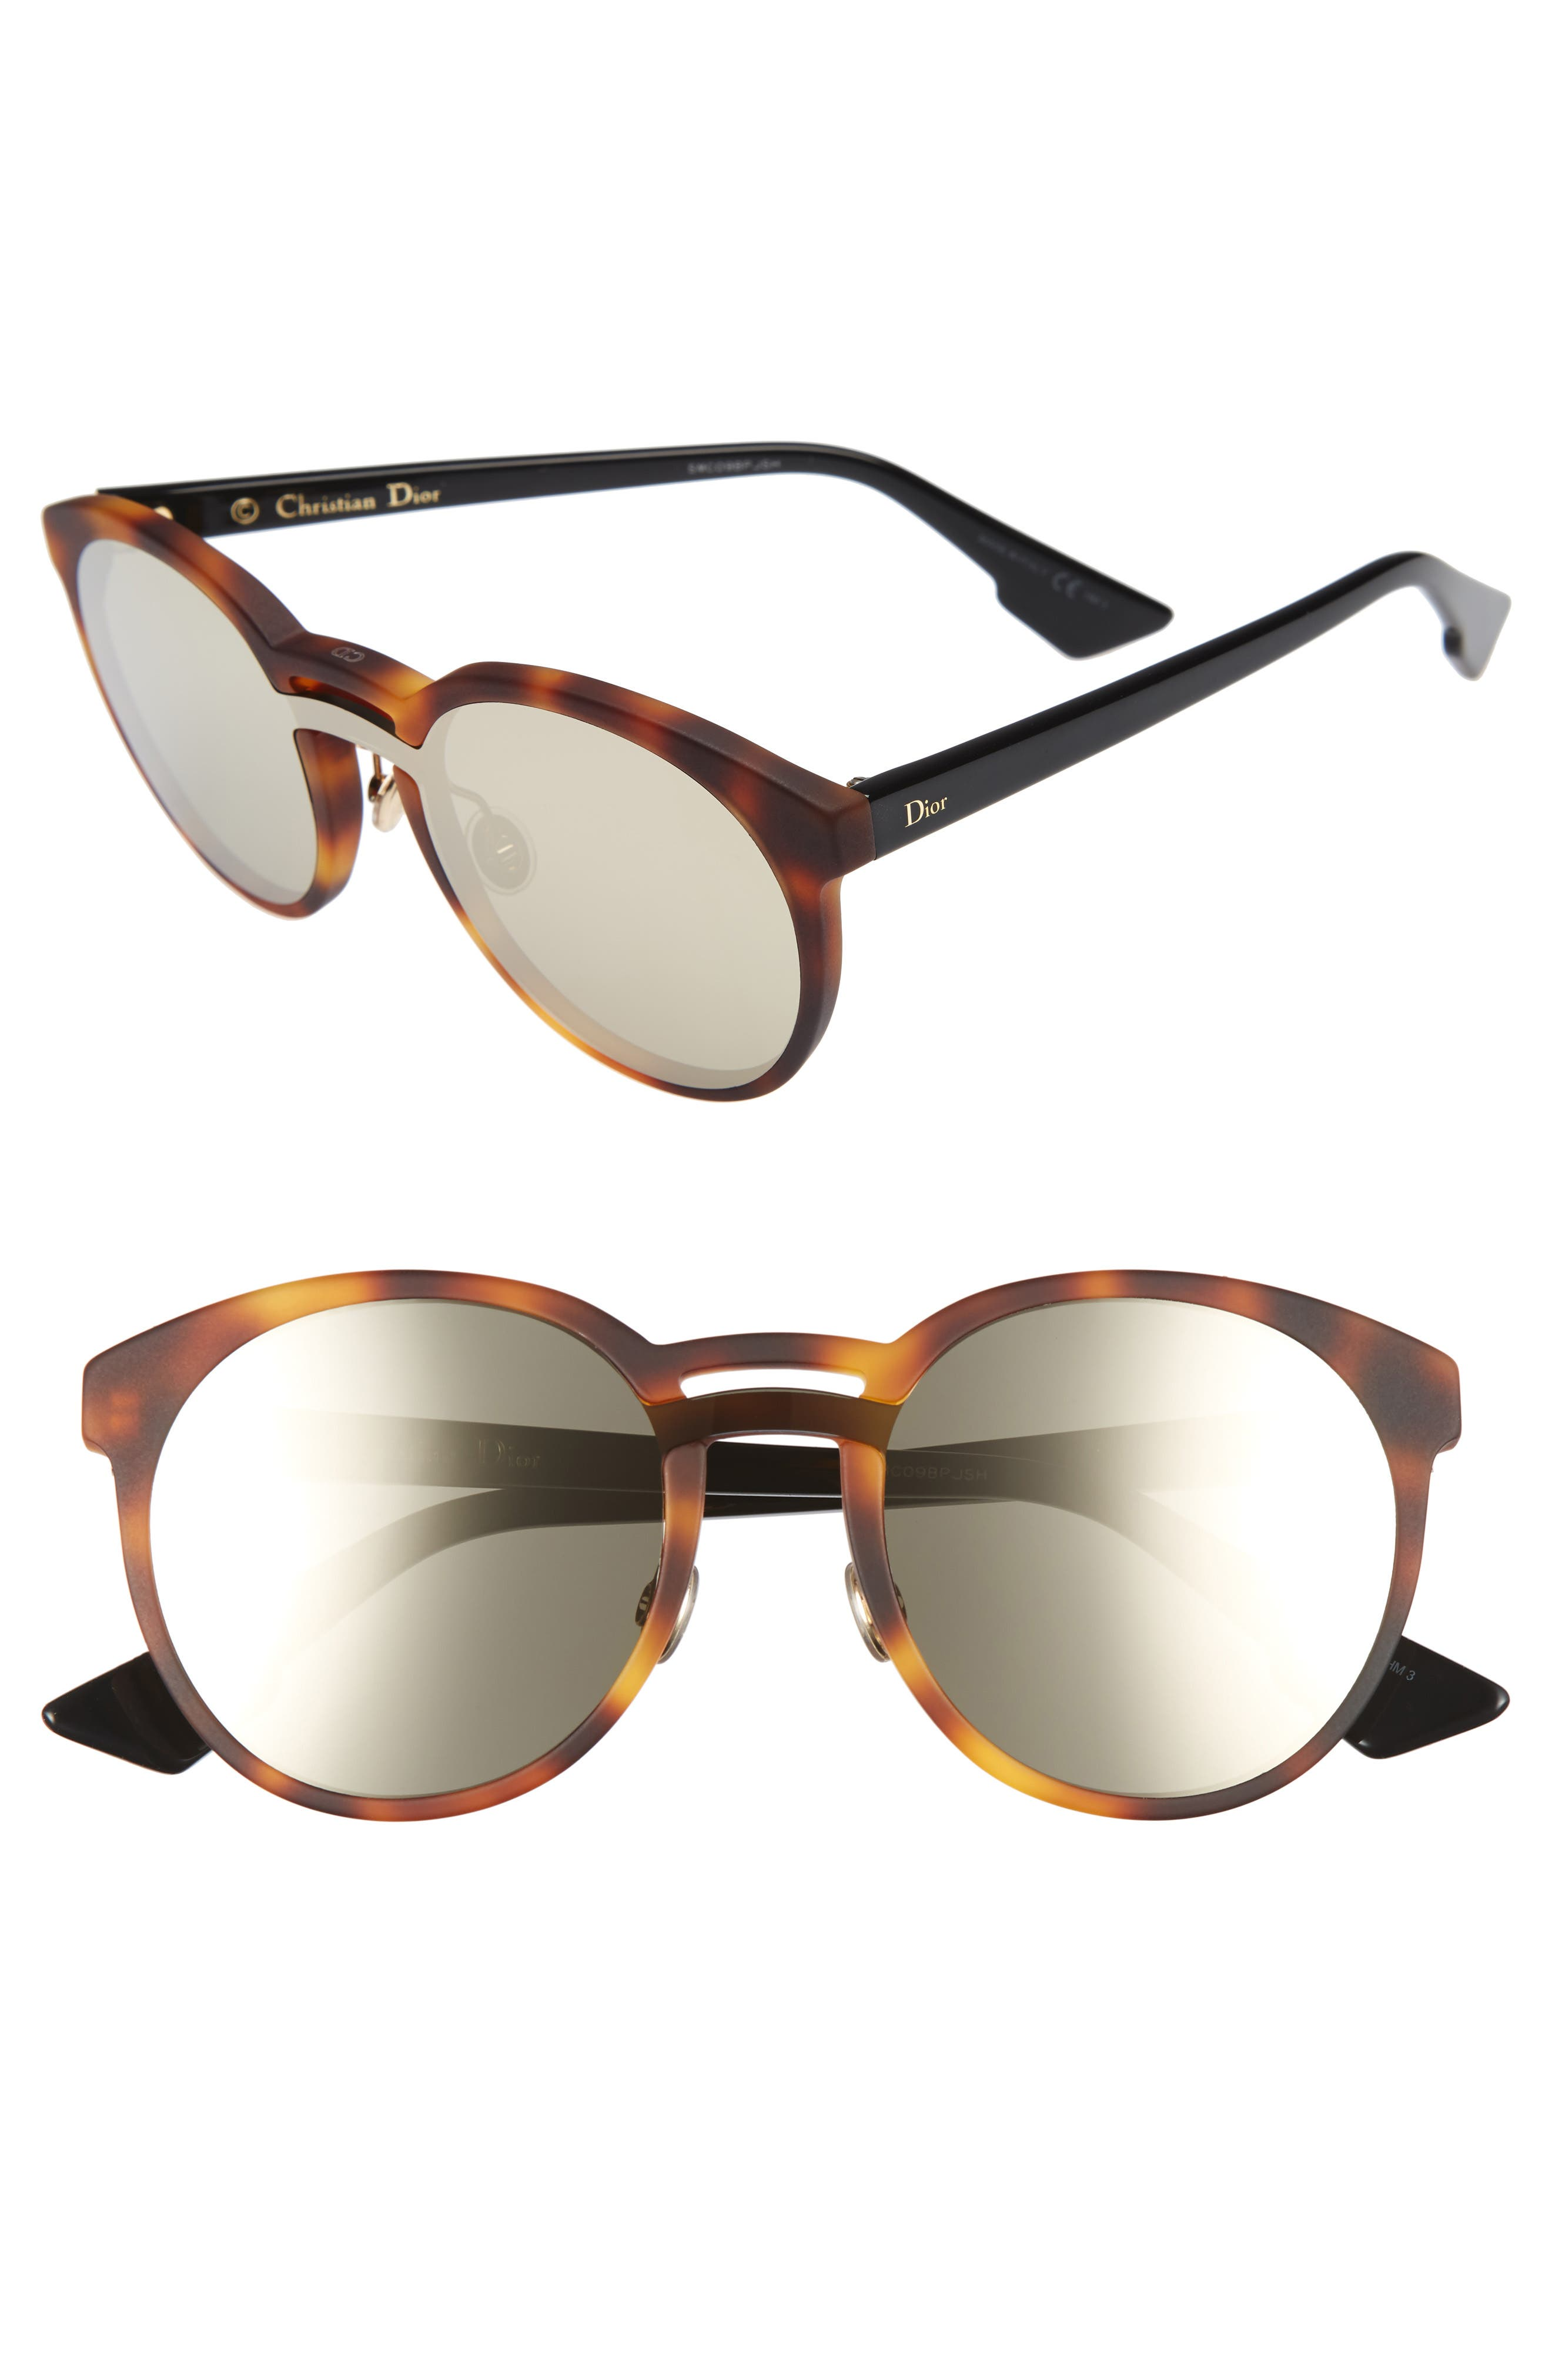 Main Image - Dior Onde 1 50mm Round Sunglasses